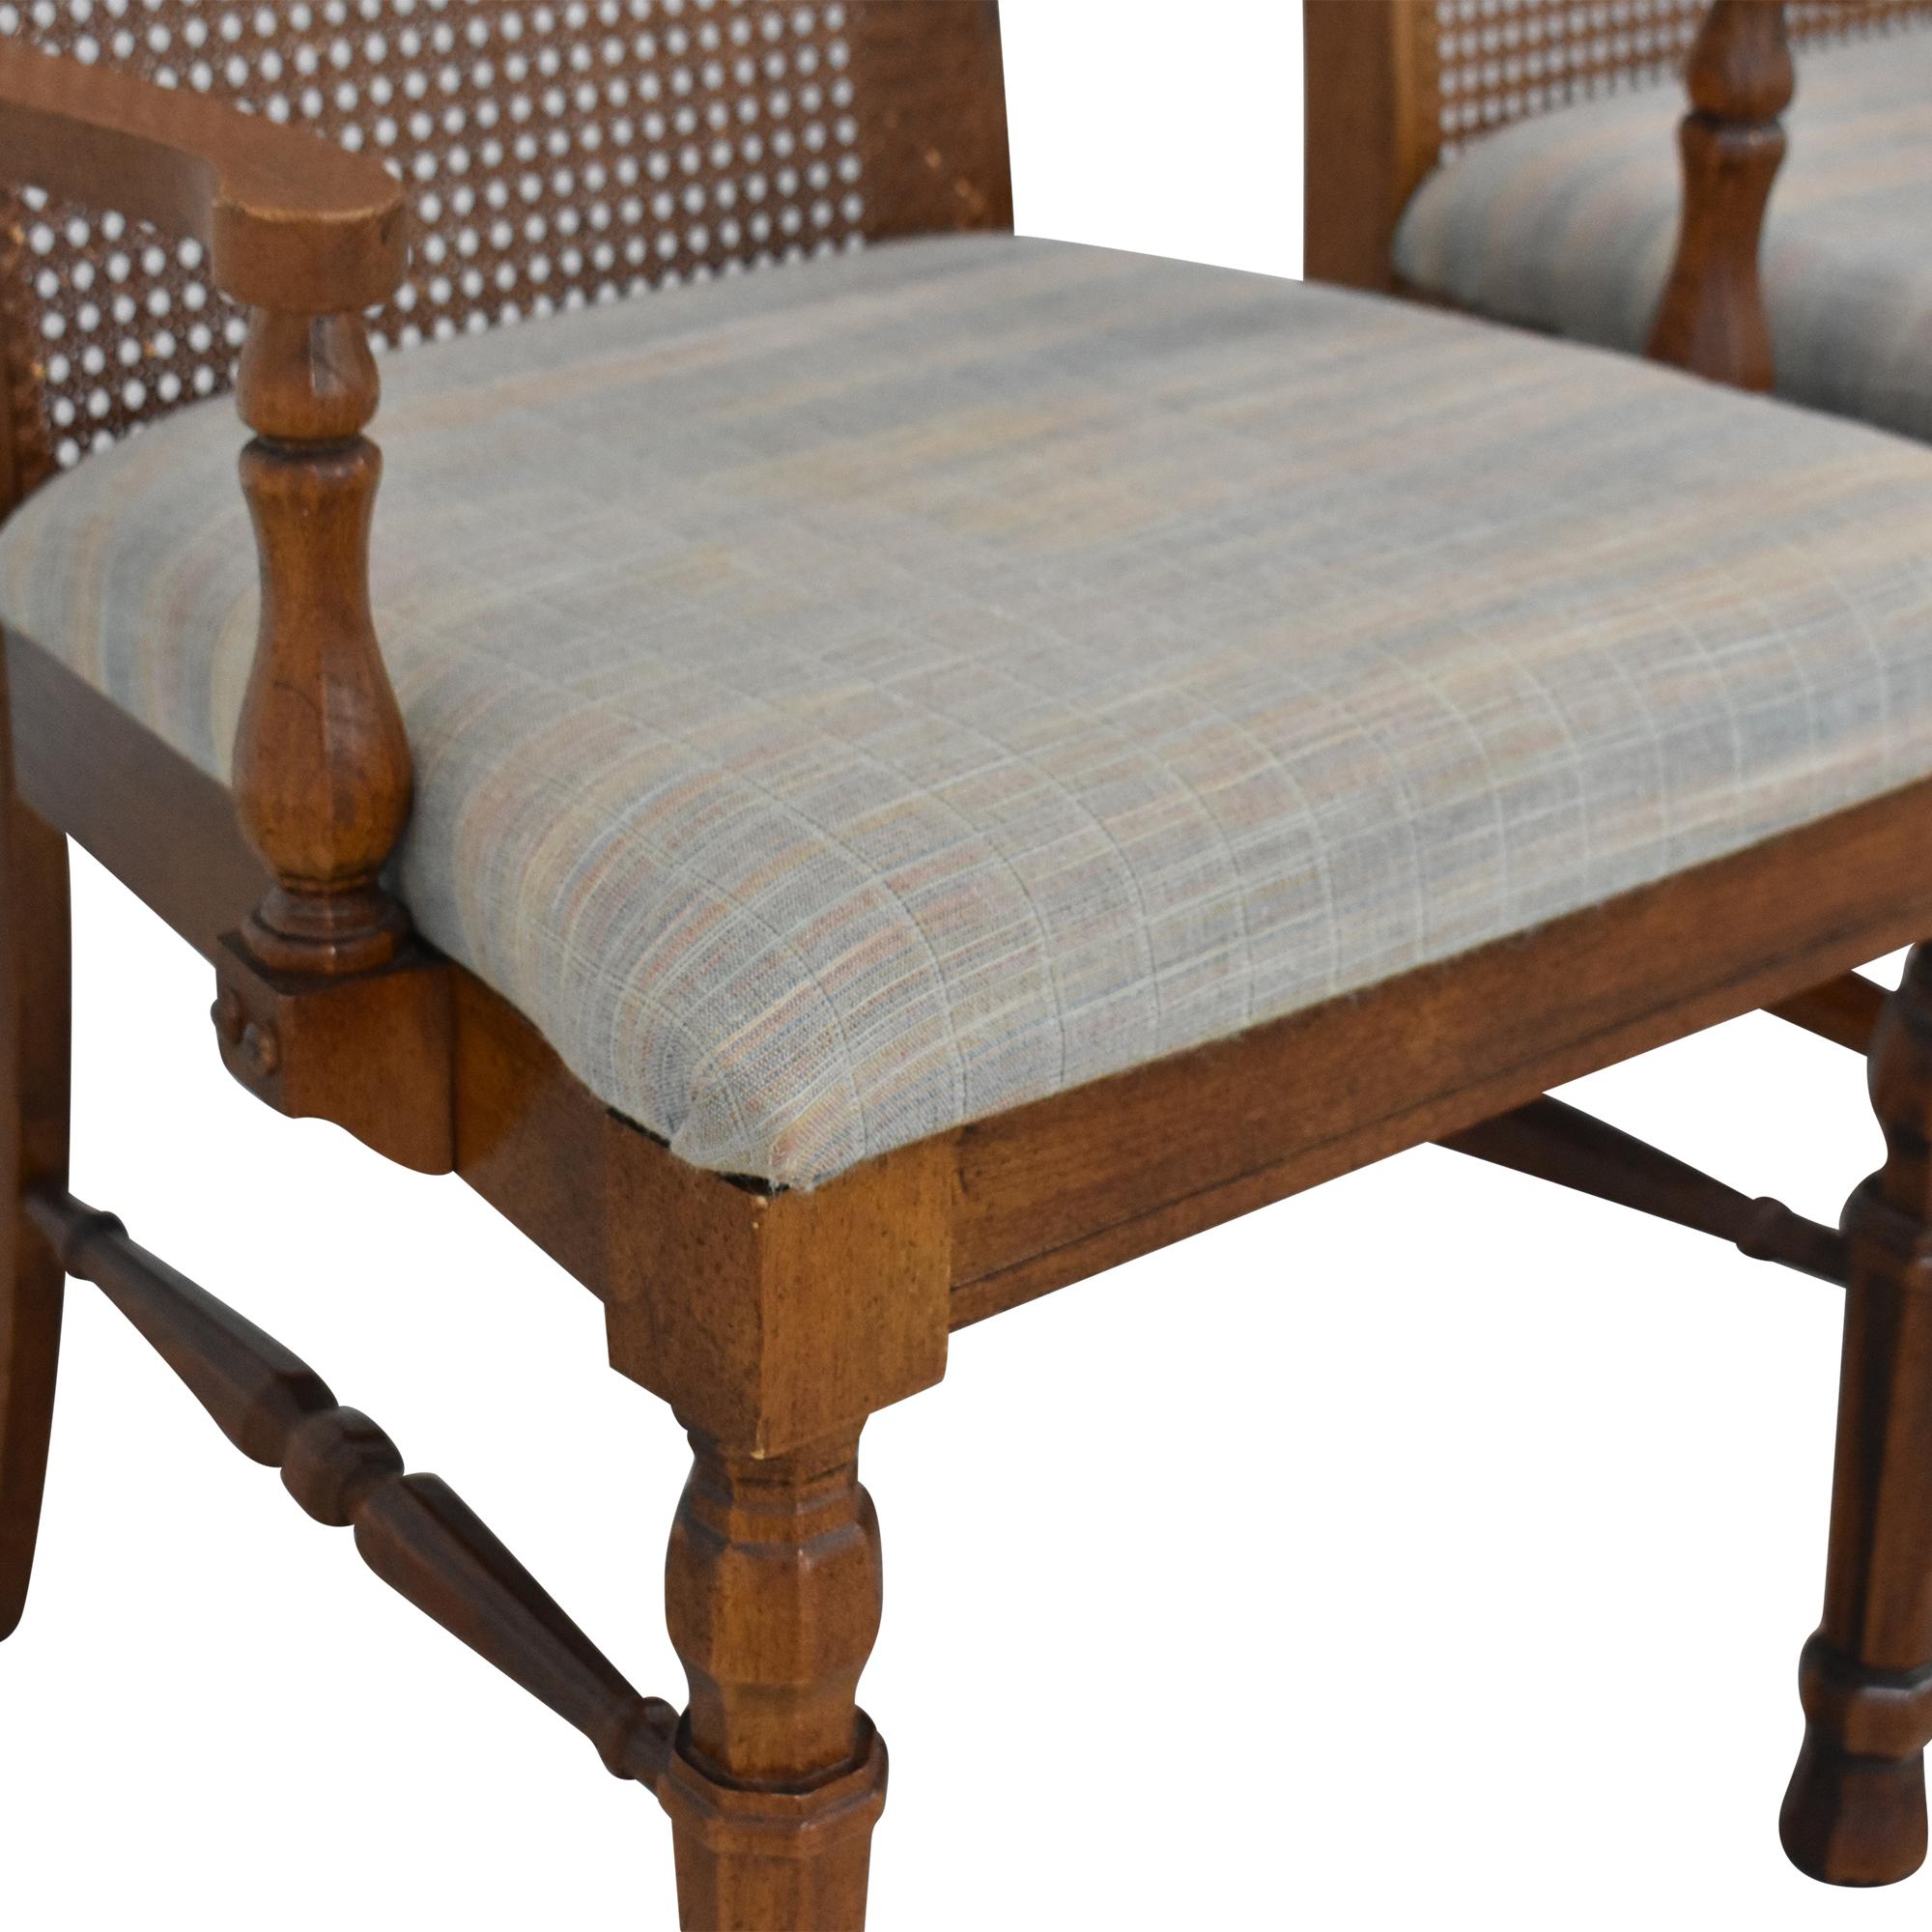 Lenoir Chair Company Lenoir Cane Back Dining Chairs brown